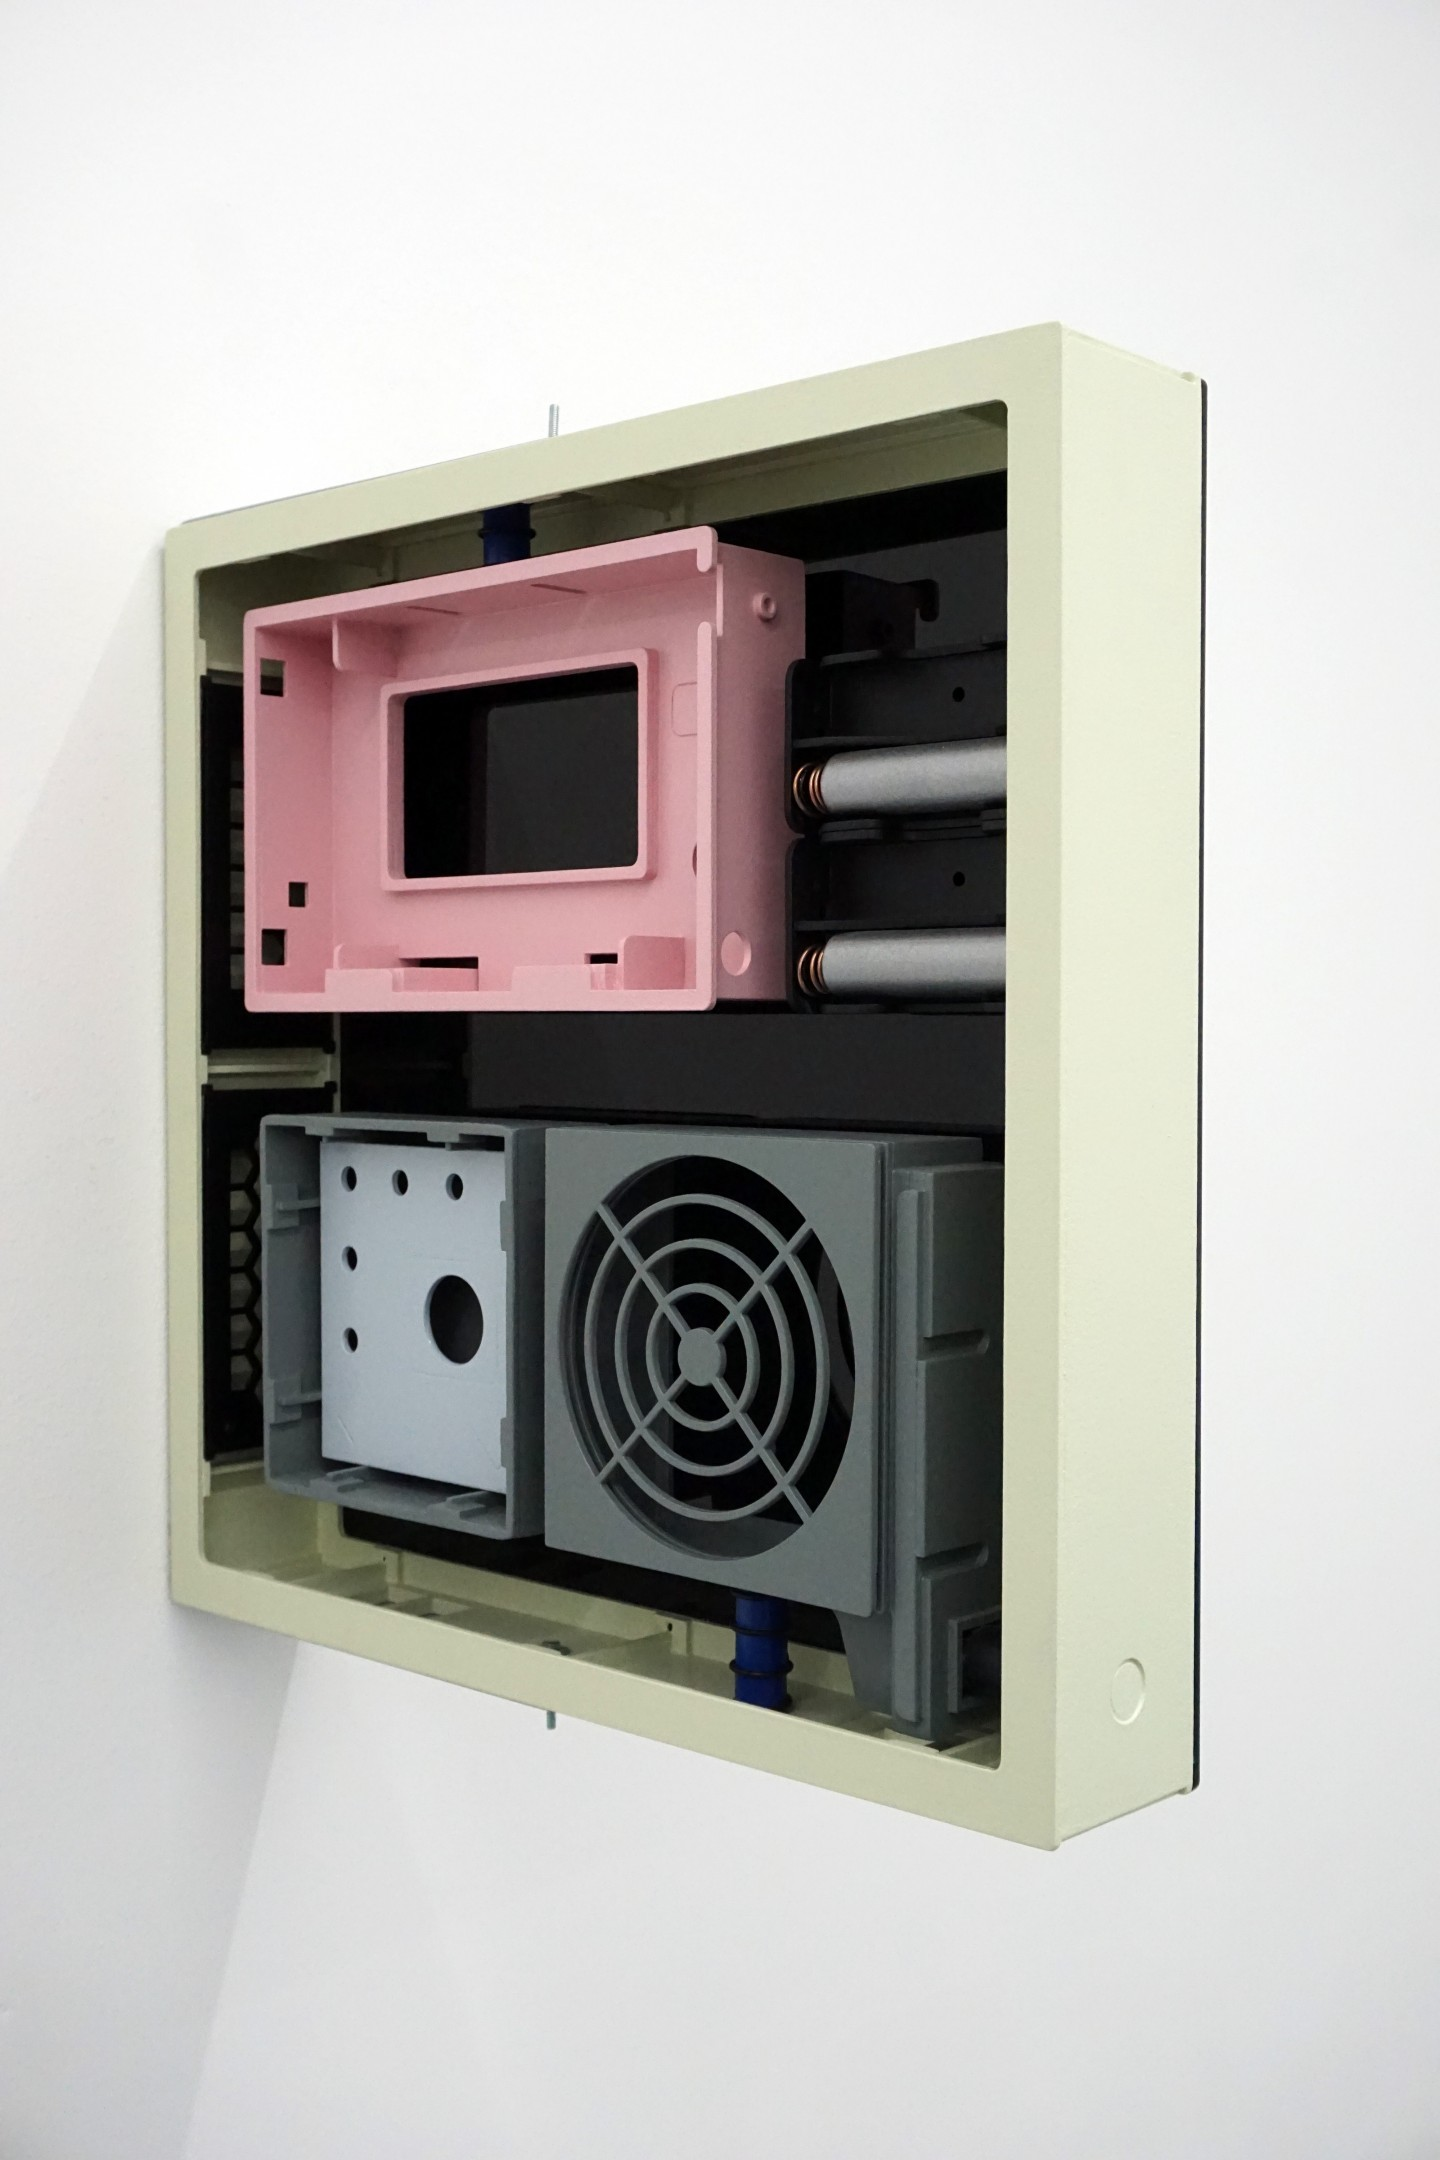 Intro-spec-tech I